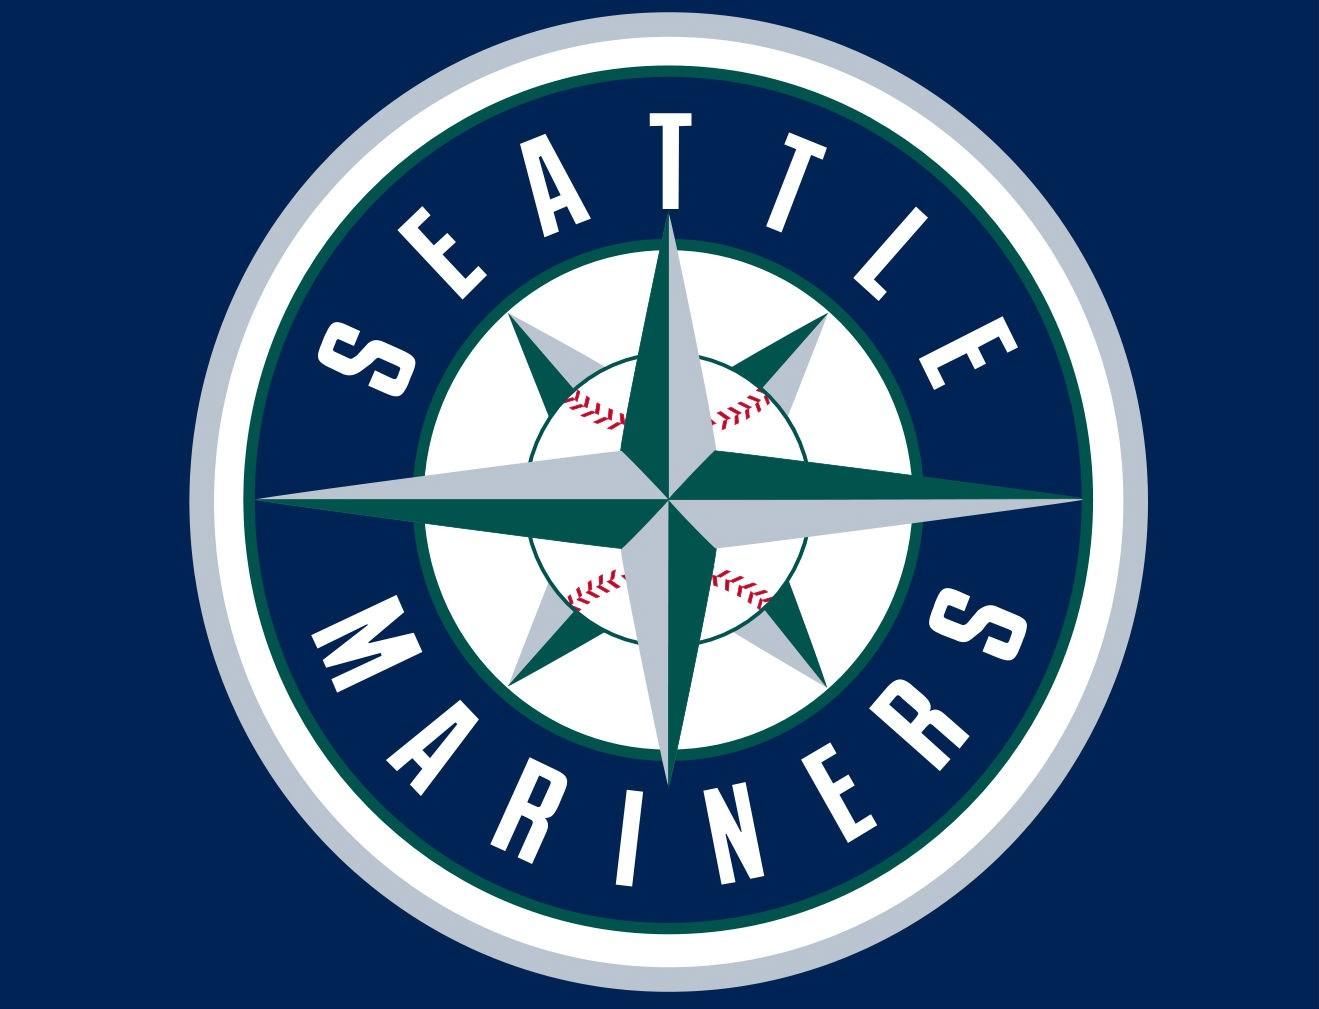 Mariners beat Blue Jays 4-2